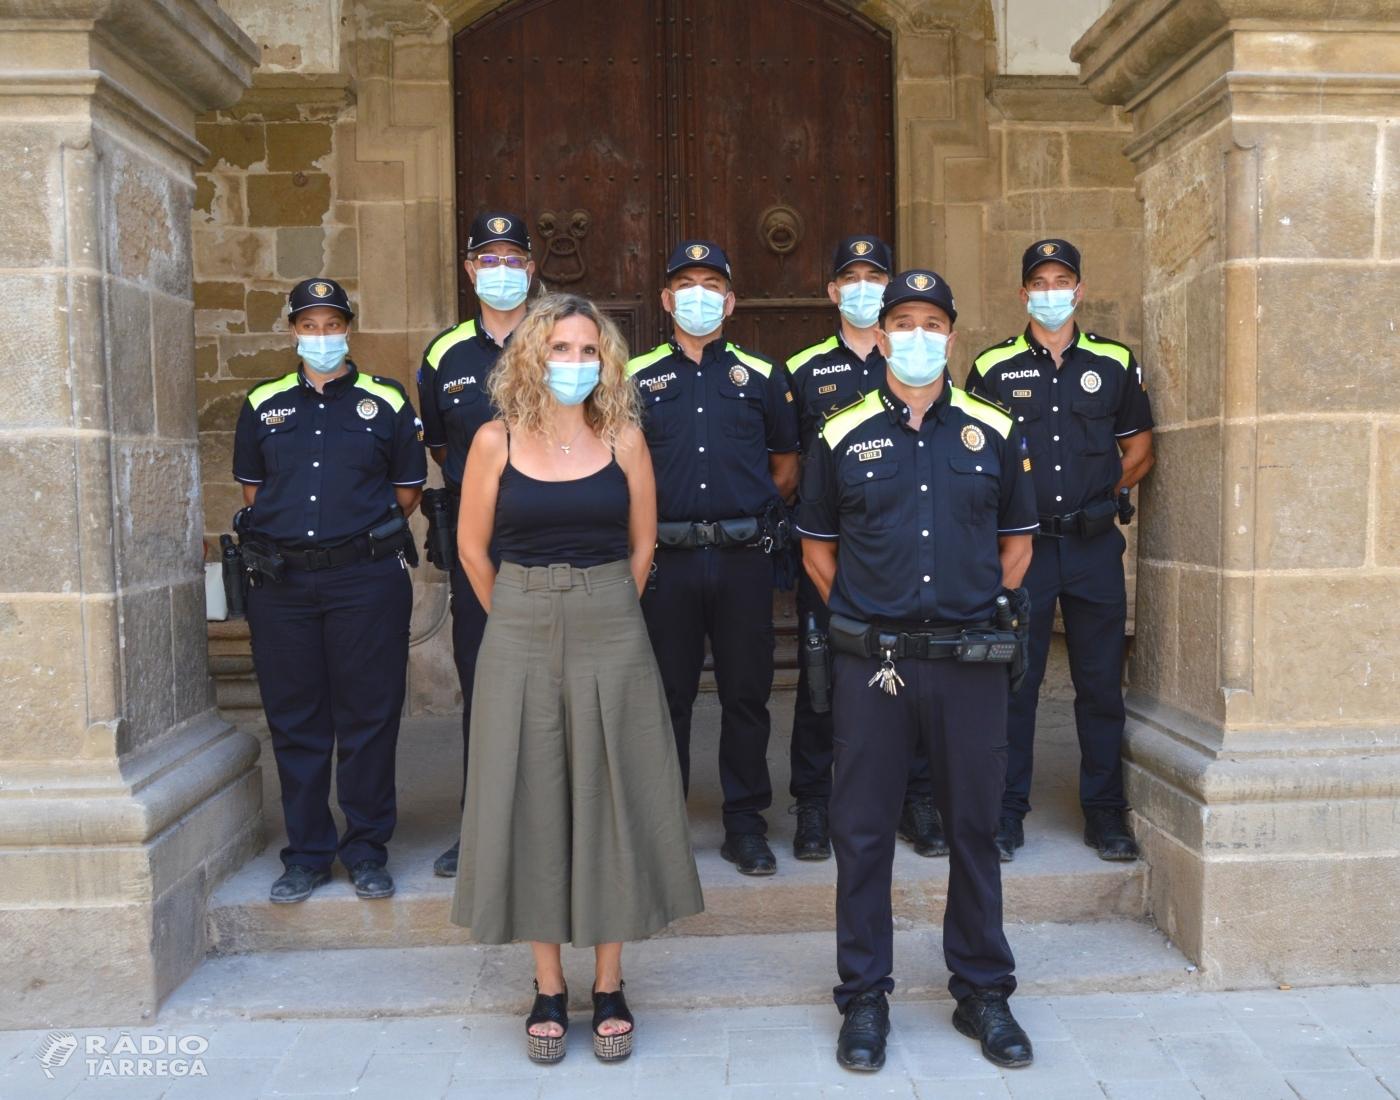 Dos nous agents a la Policia Local d'Agramunt